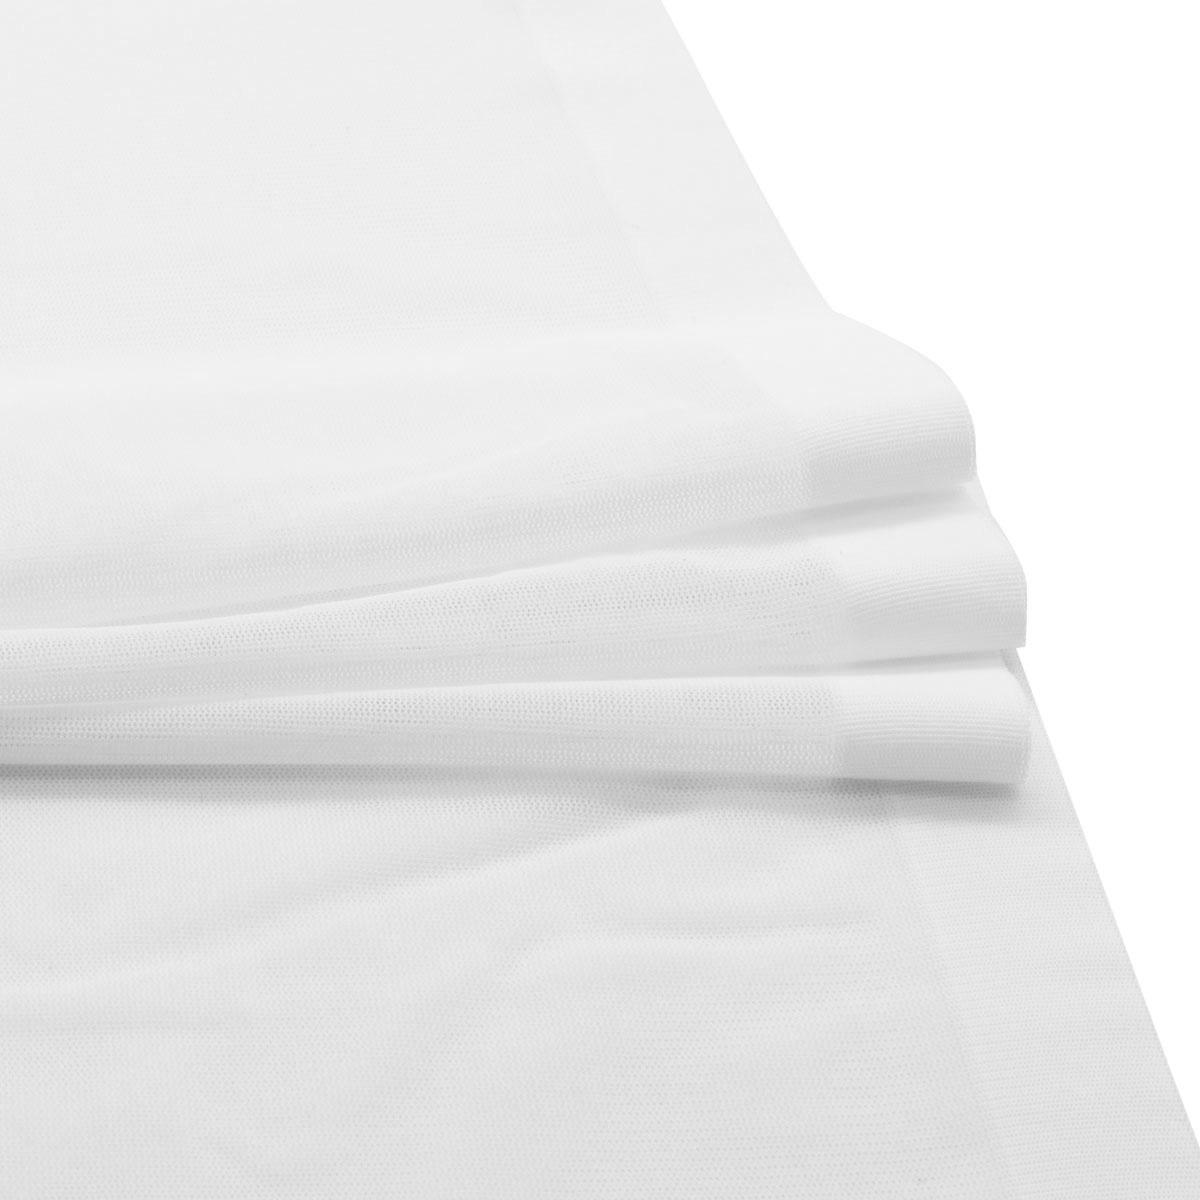 SU 66 Ткань эластичная бельевая 16 см*10